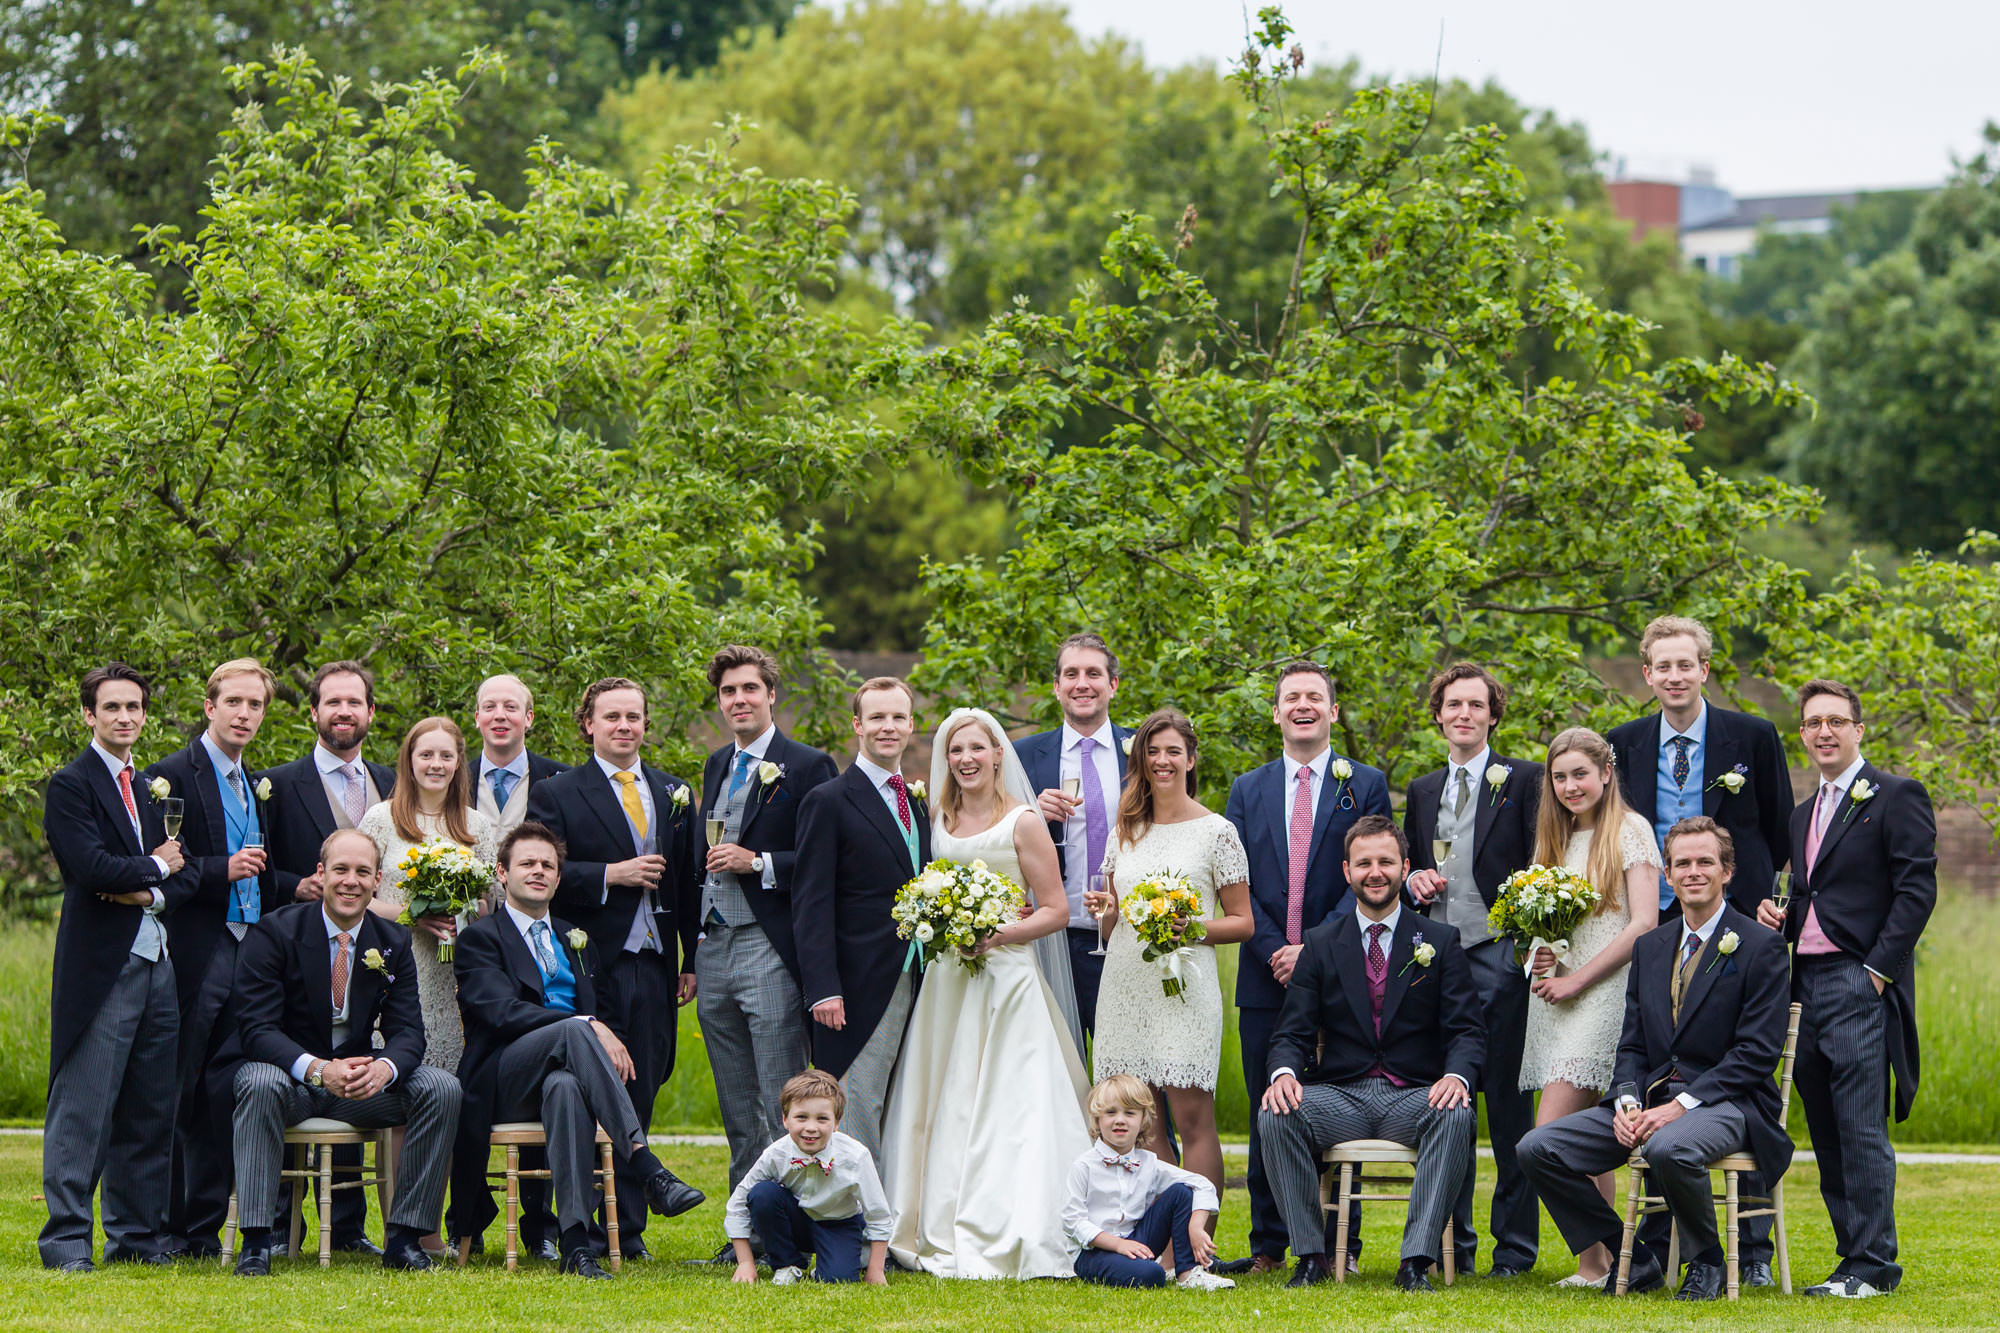 Groups photos at Fulham Palace Wedding